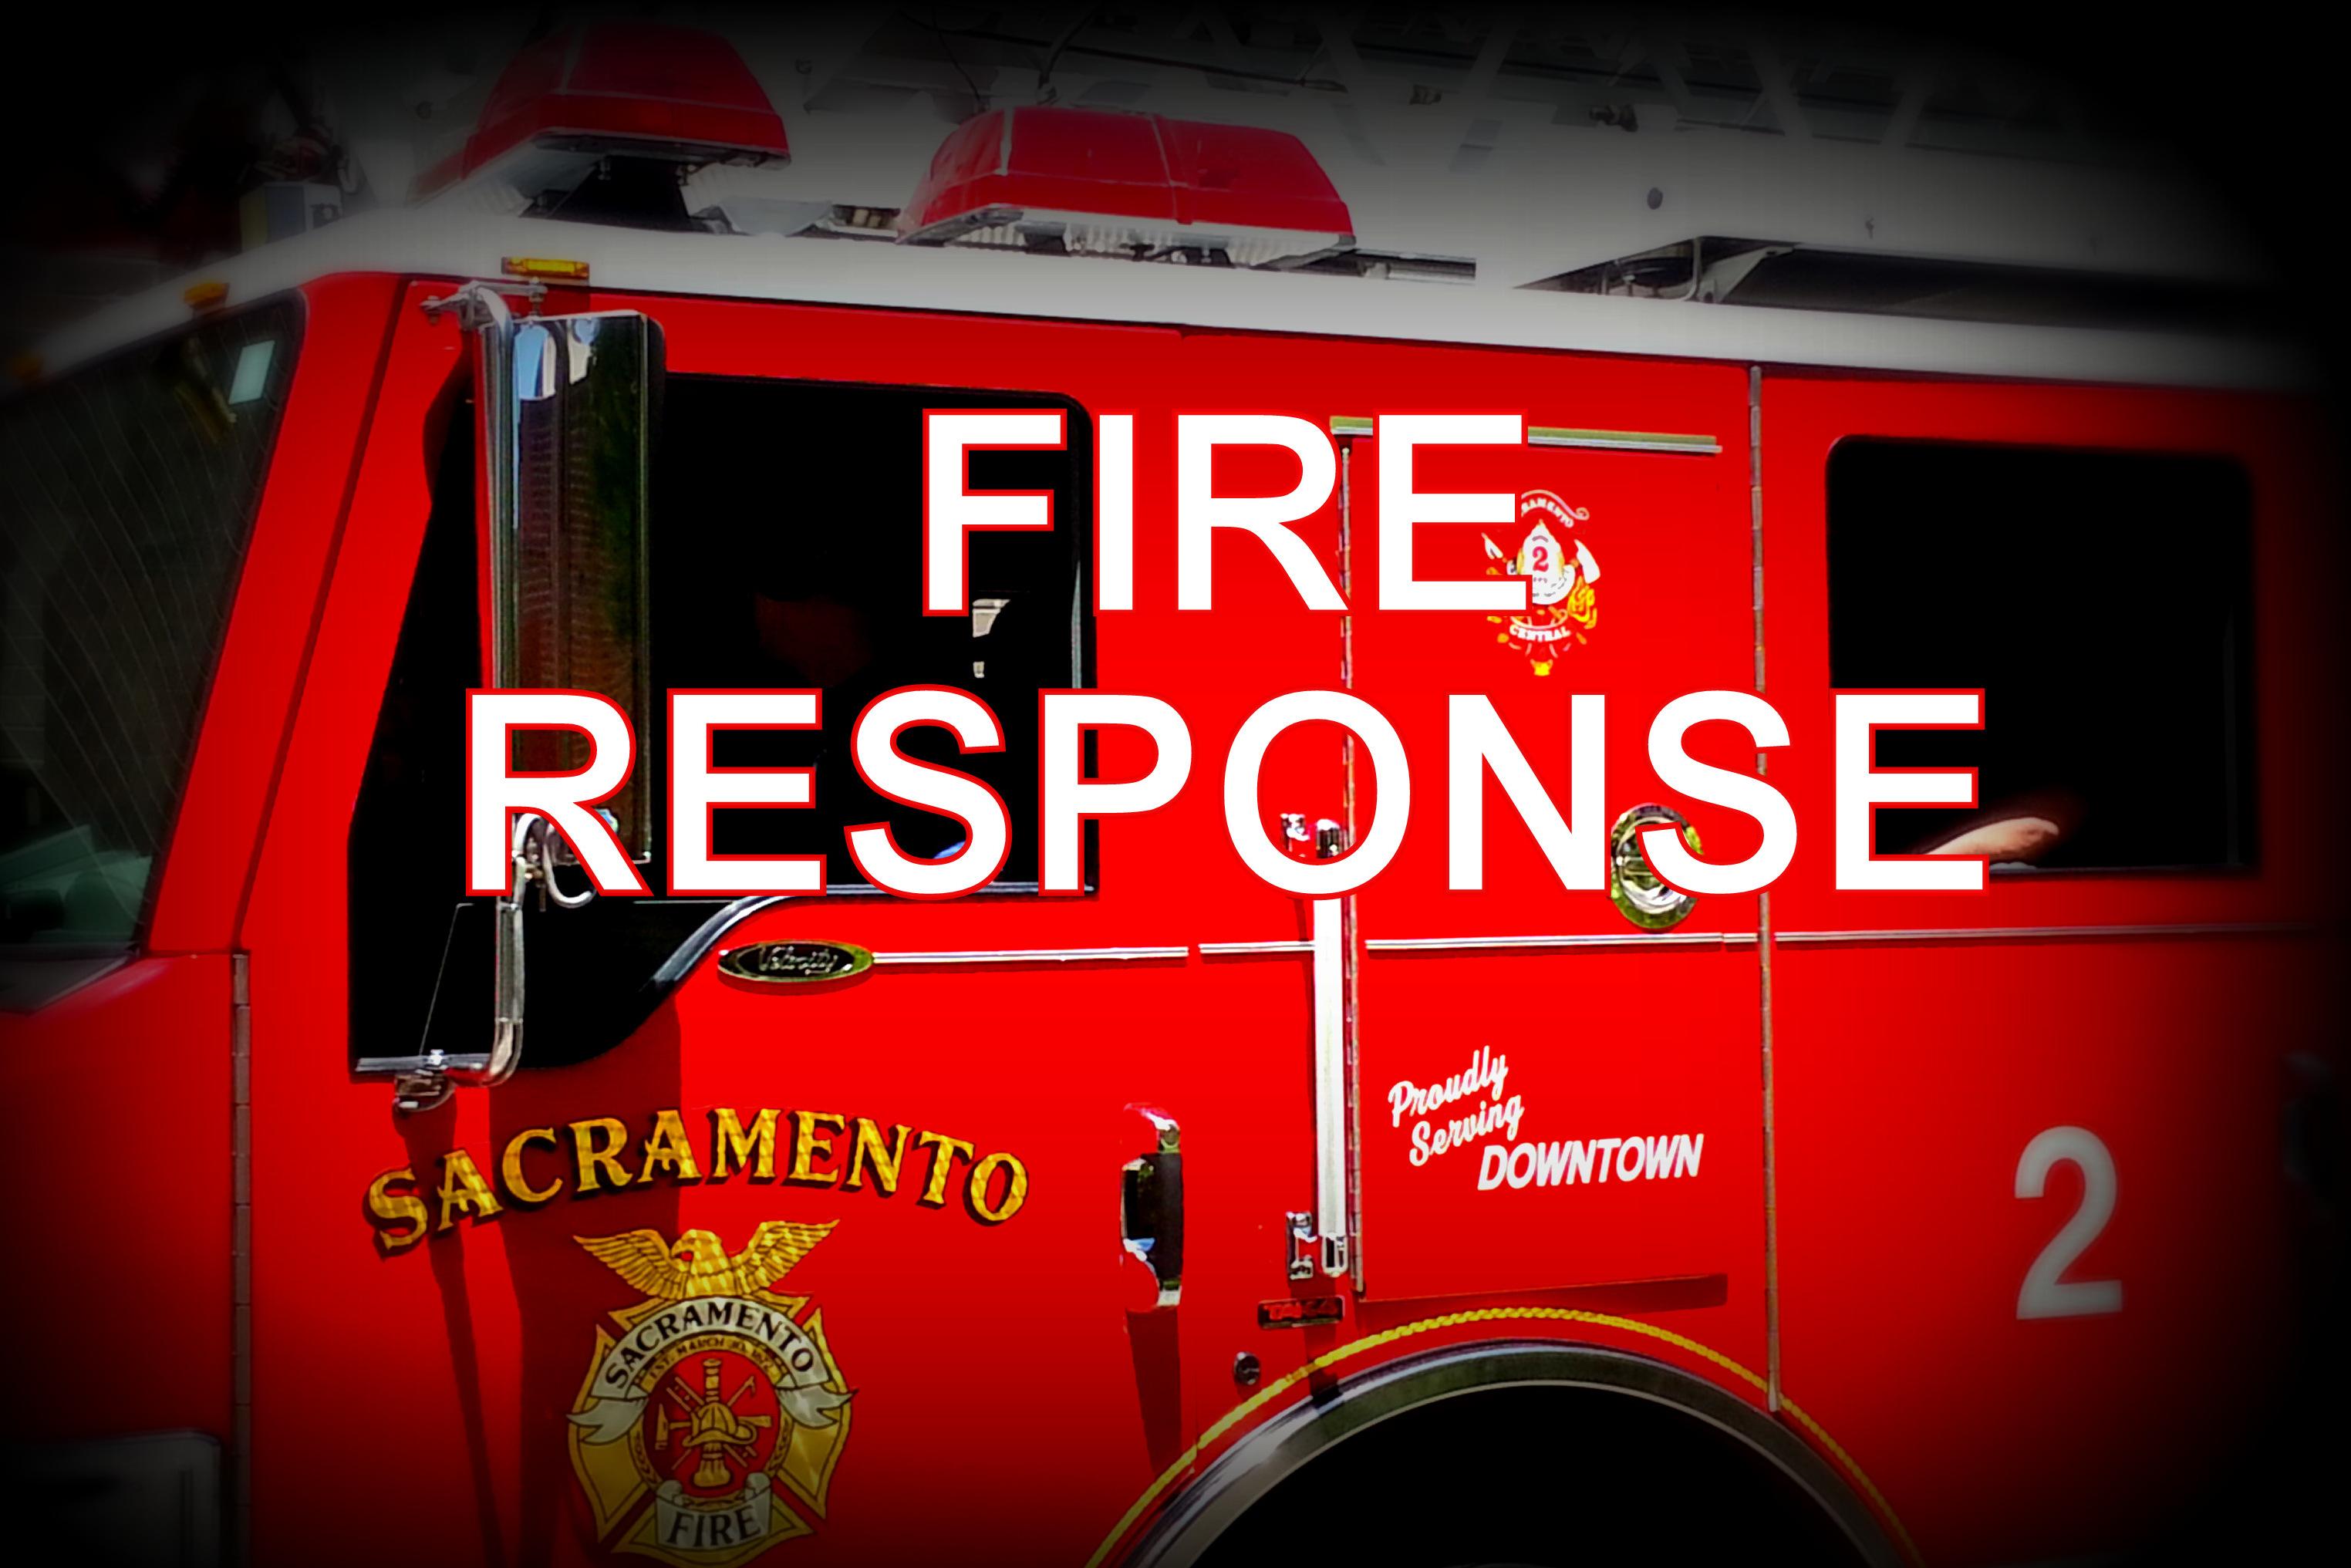 West Sacramento Ikea Store Evacuated After Small Fire